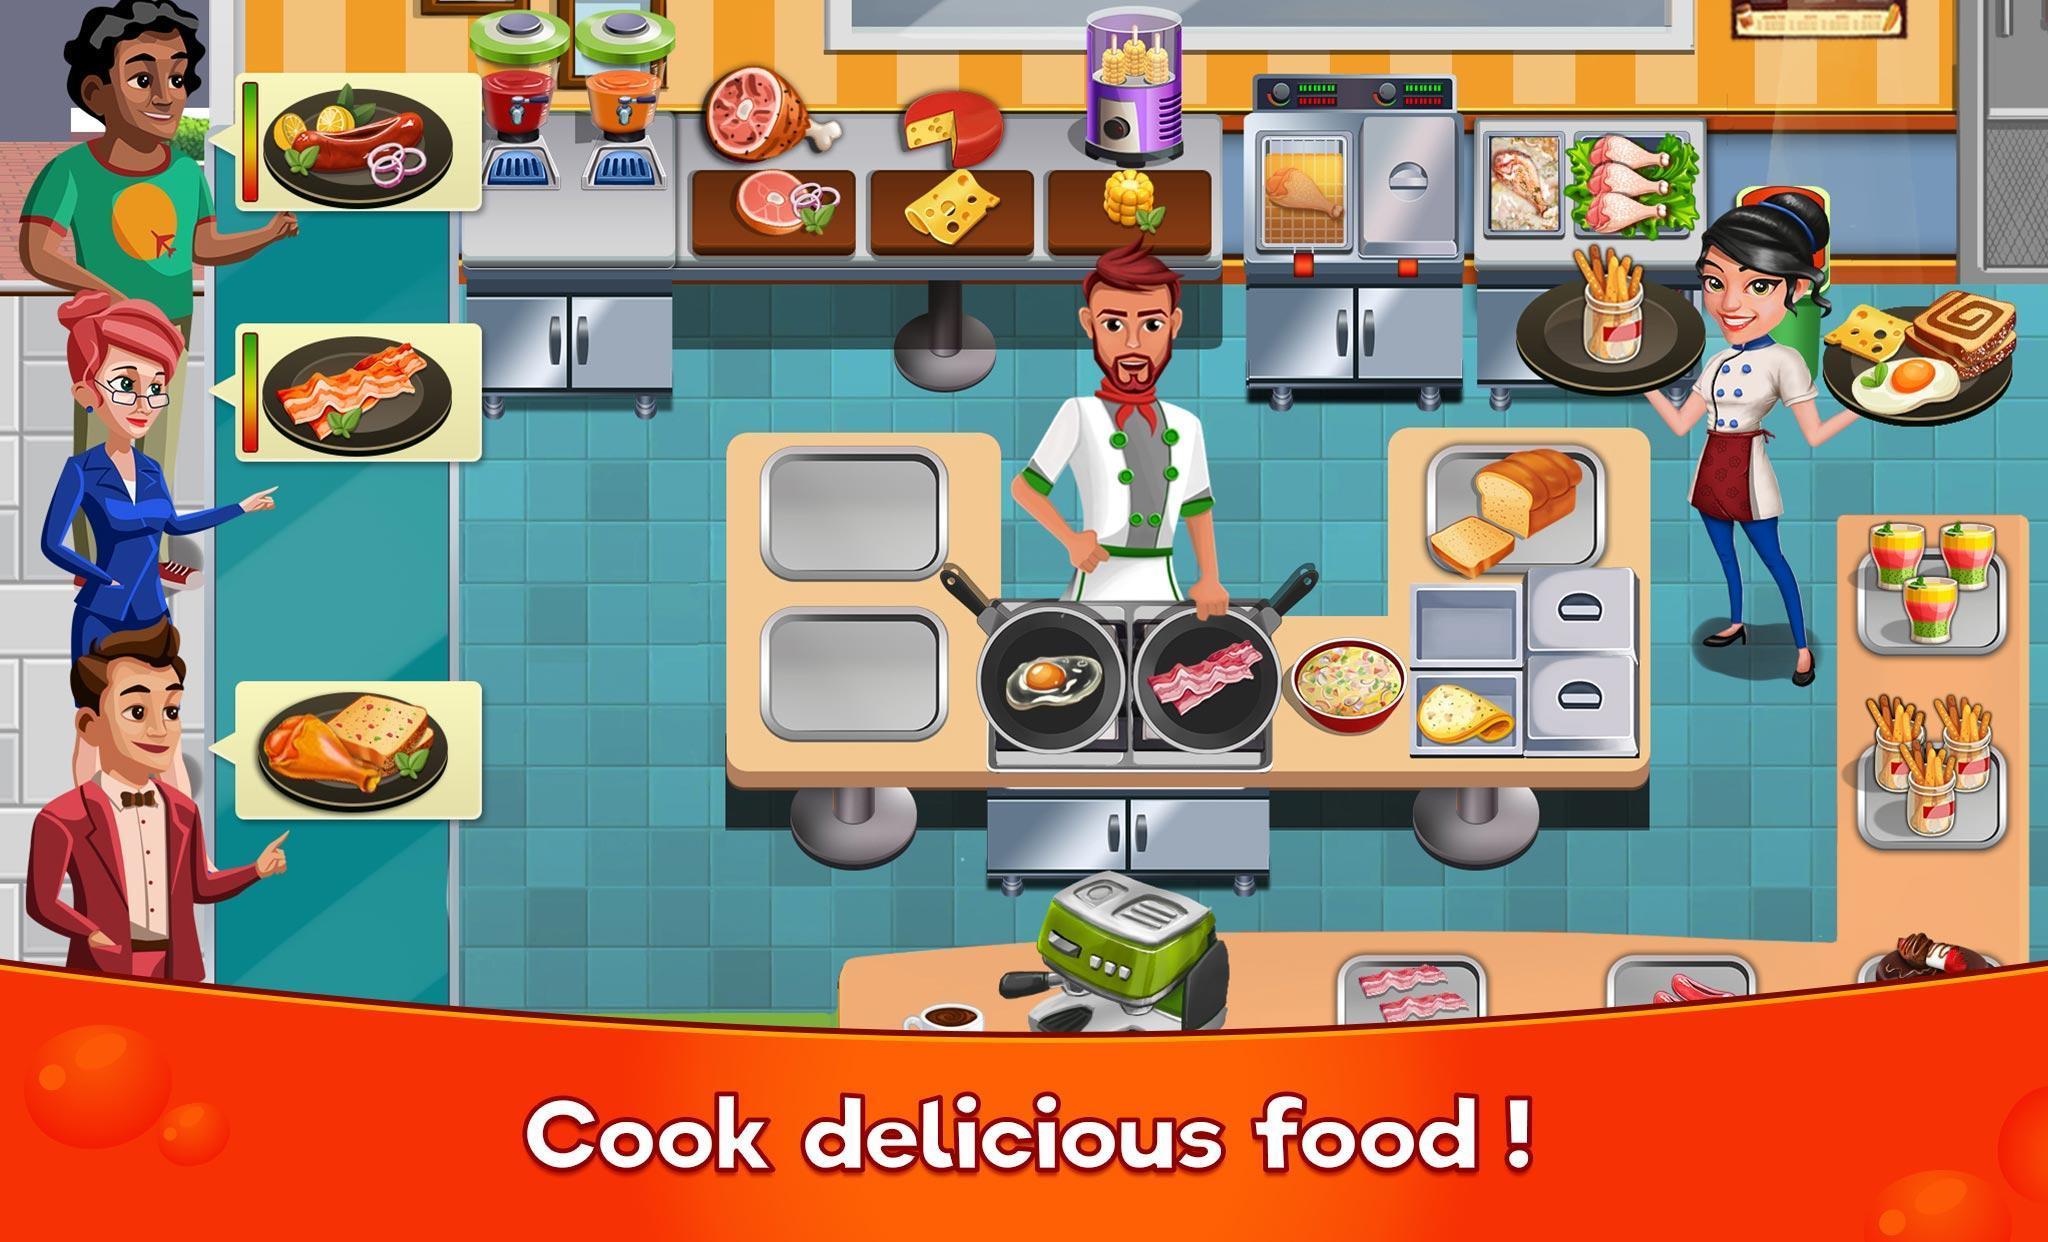 Cooking Cafe Restaurant Girls - Best Cooking Game 2.0.3 Screenshot 1